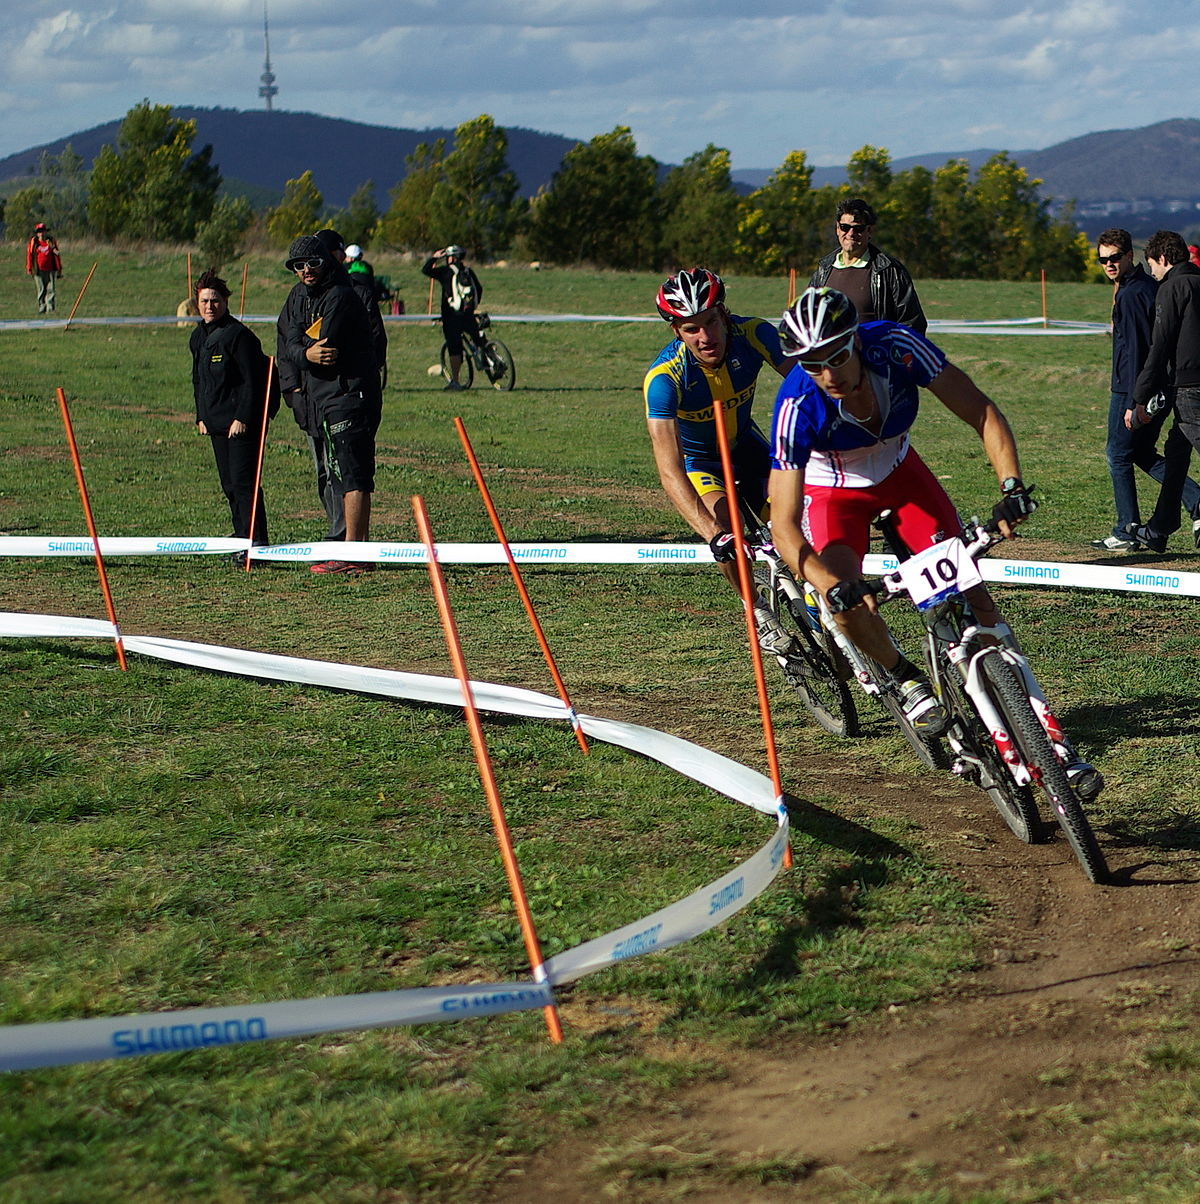 Cross Country Ciclismo Wikipedia La Enciclopedia Libre